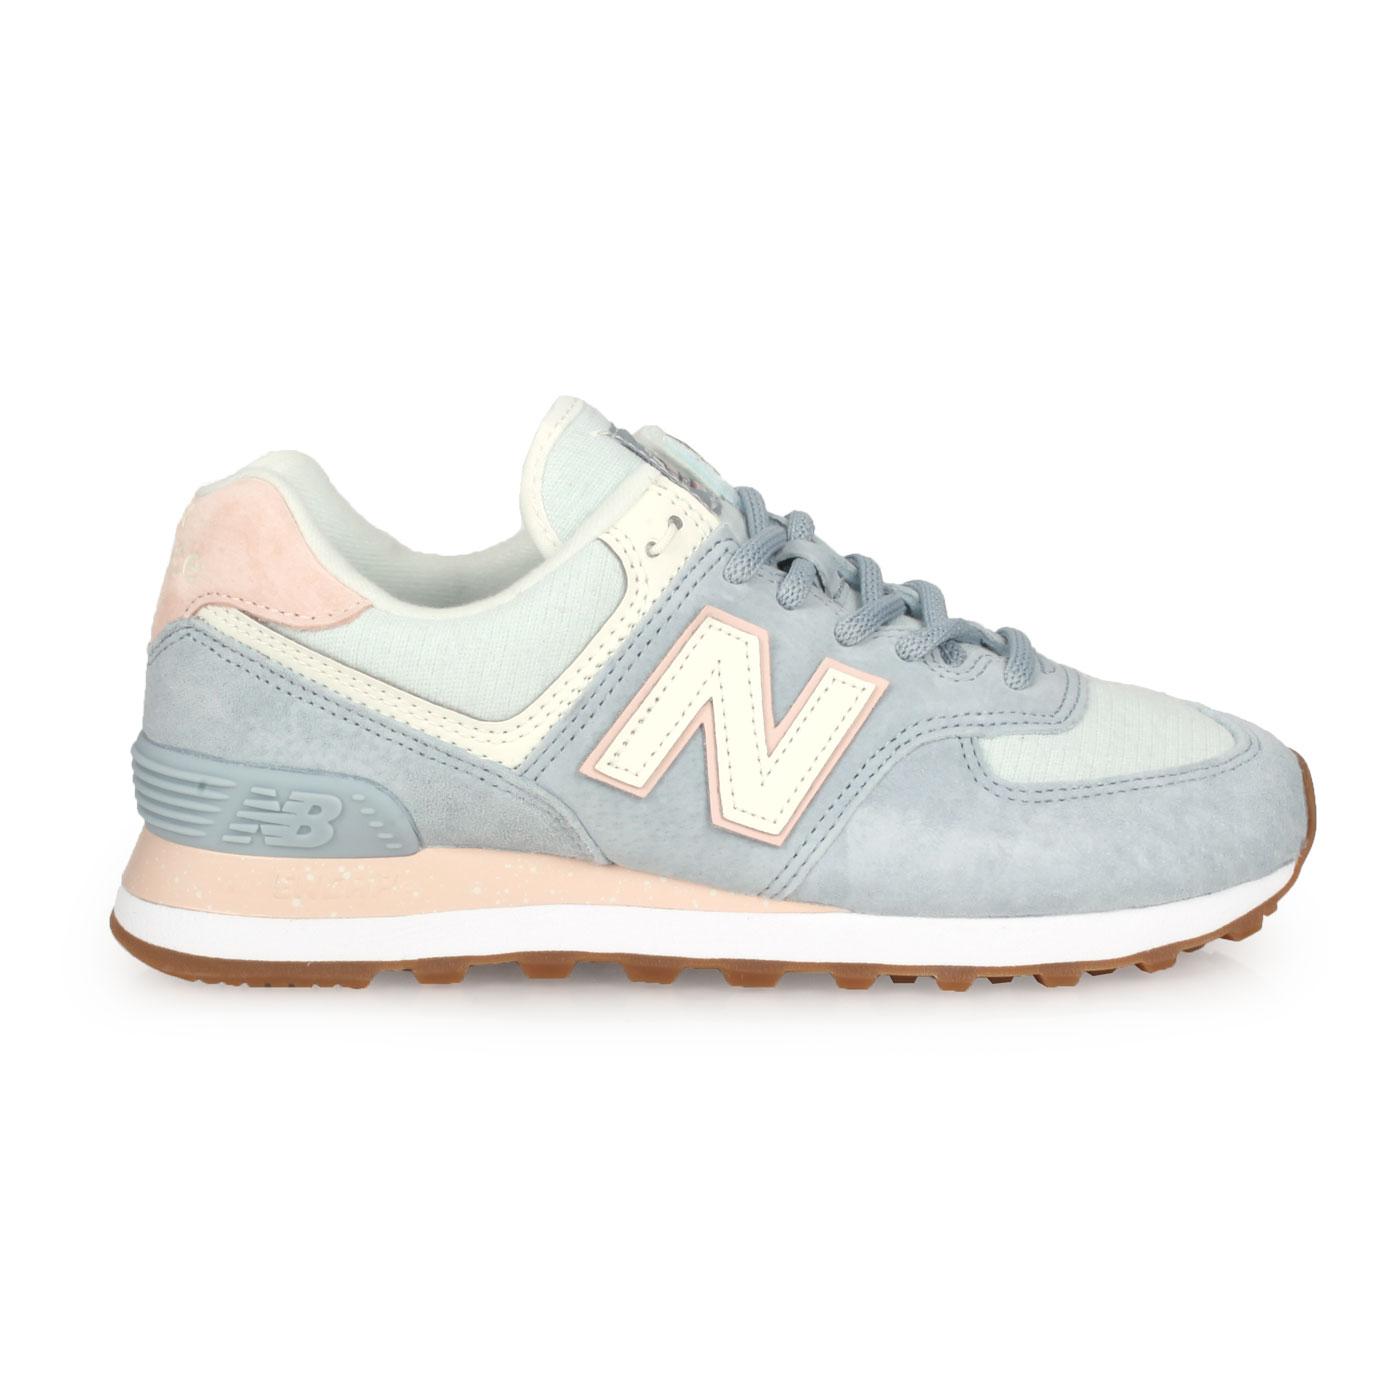 NEW BALANCE 女款復古慢跑鞋 WL574SUO - 粉藍白淺粉